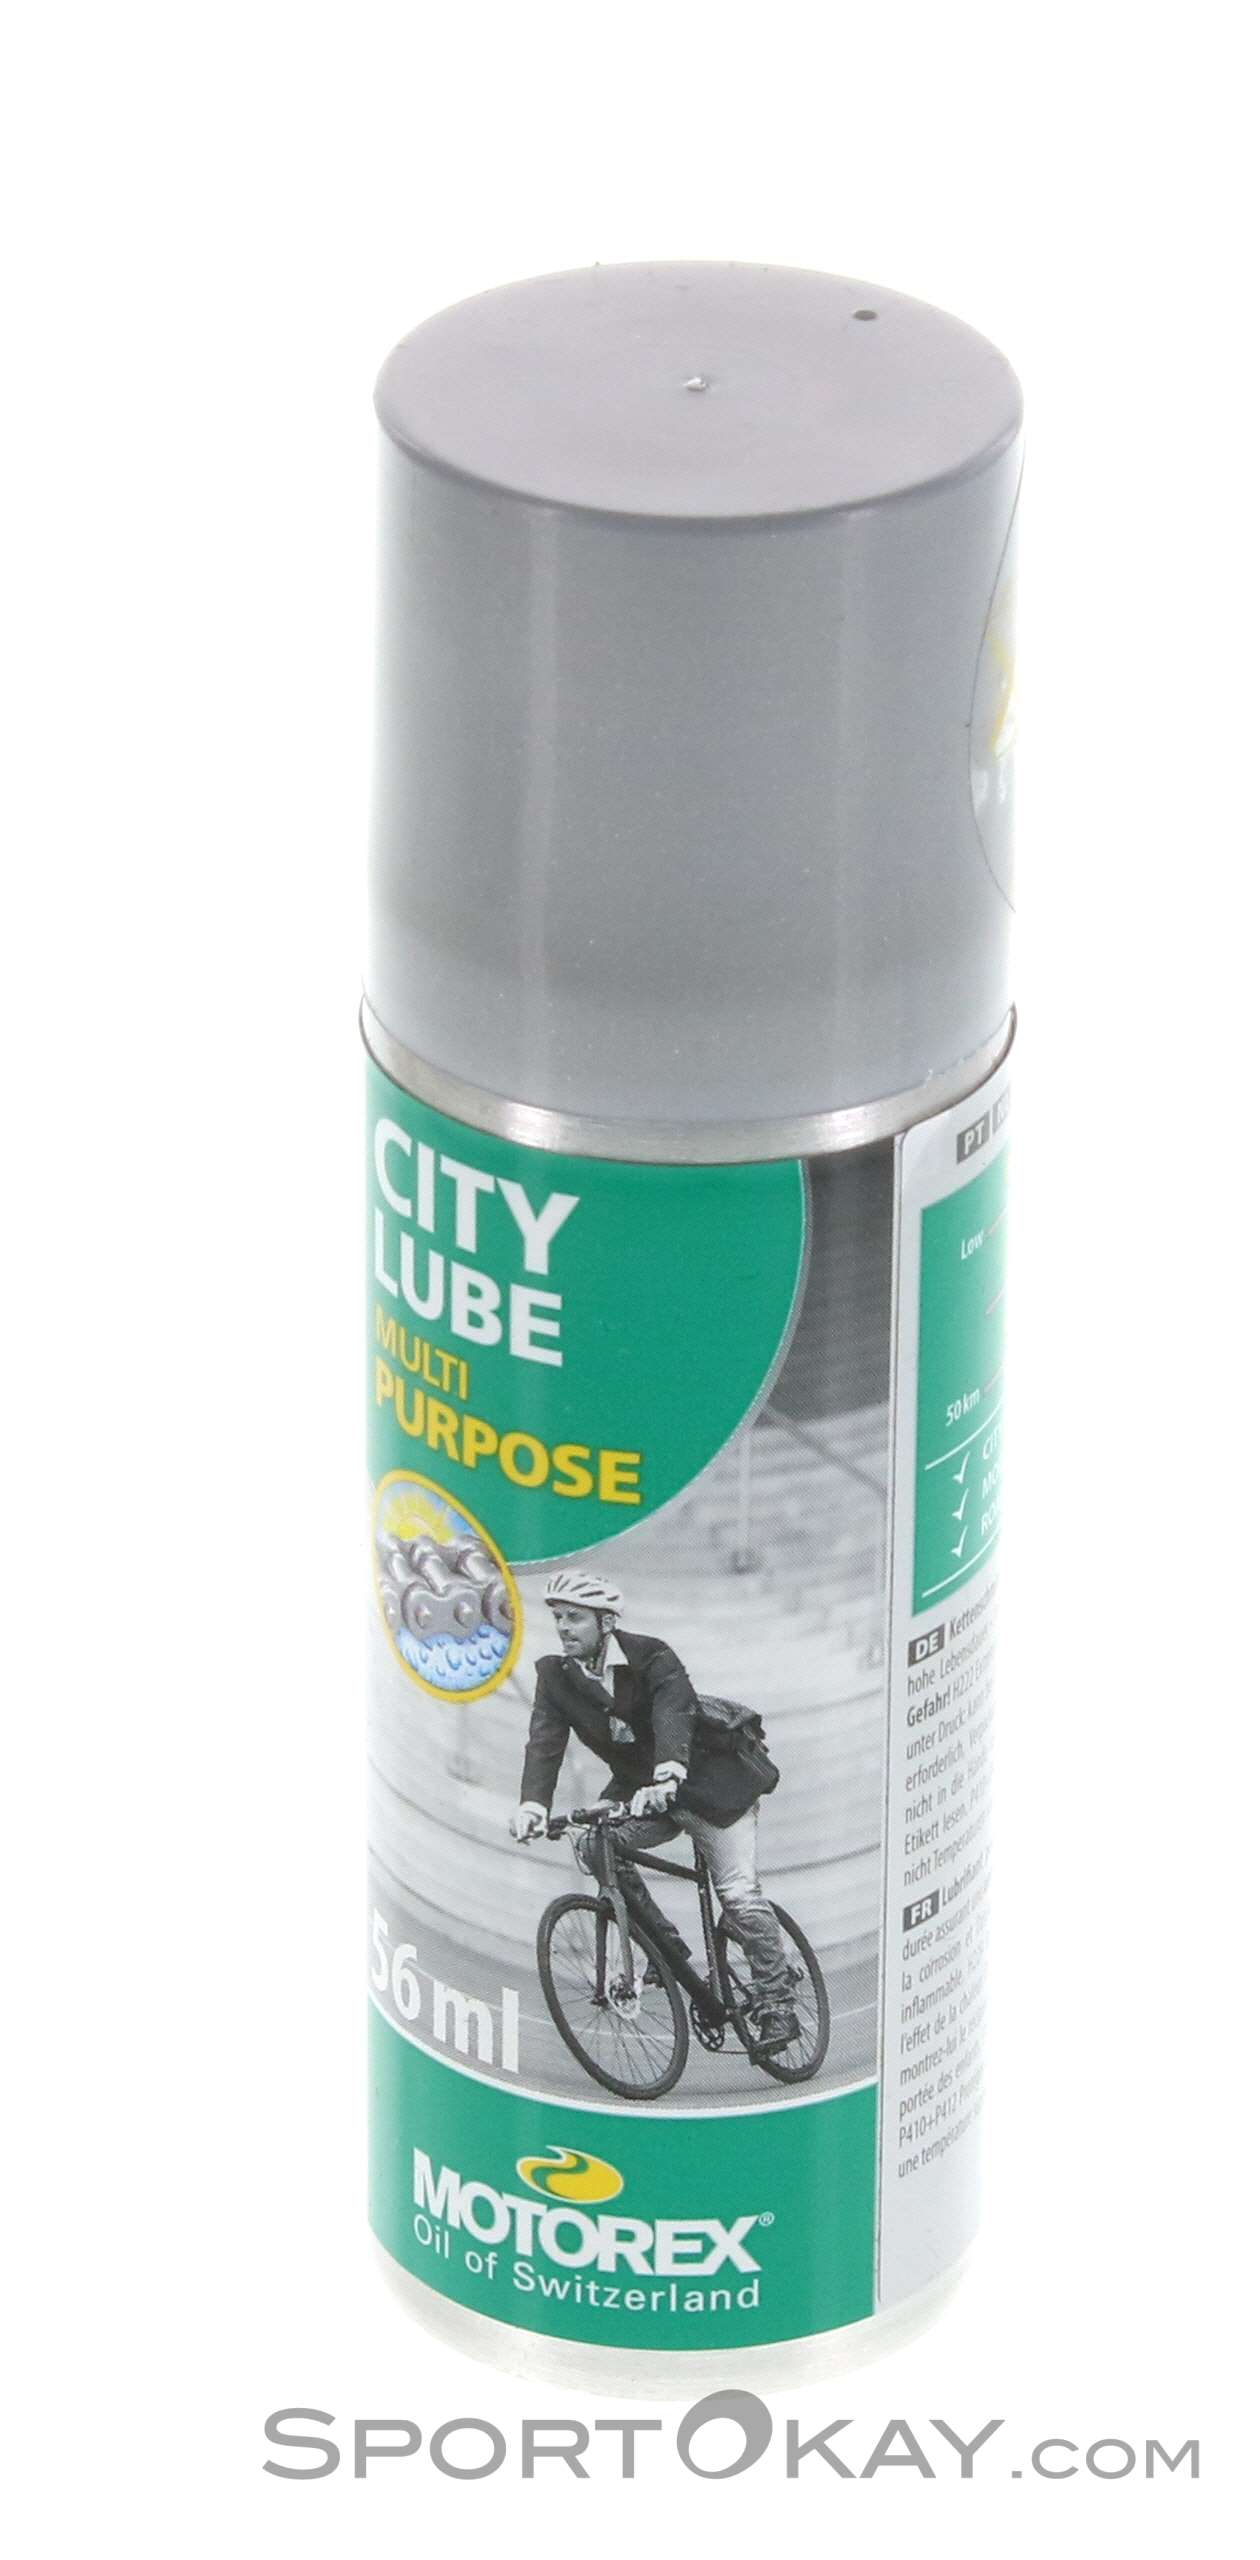 Motorex city lube kettenschmiermittel 56ml sonstiges for Motor city quick lube